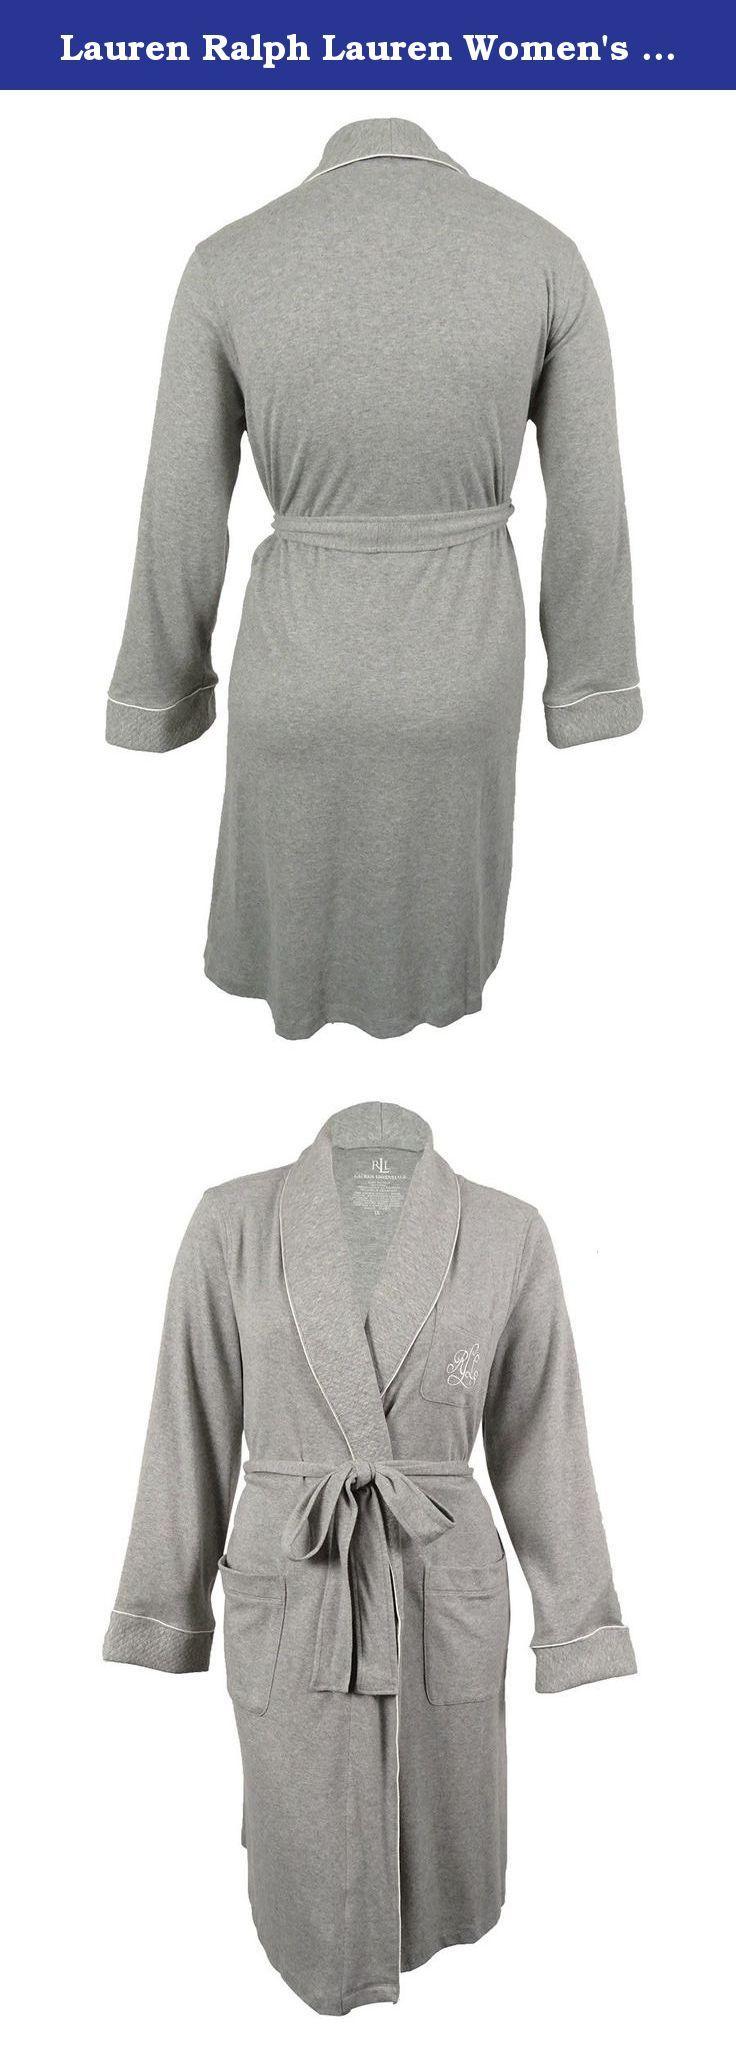 Lauren Ralph Lauren Women's Shawl-Collar Short Robe (L, Heather Grey). This robe features soft cotton fabric and embroidered LRL logo.